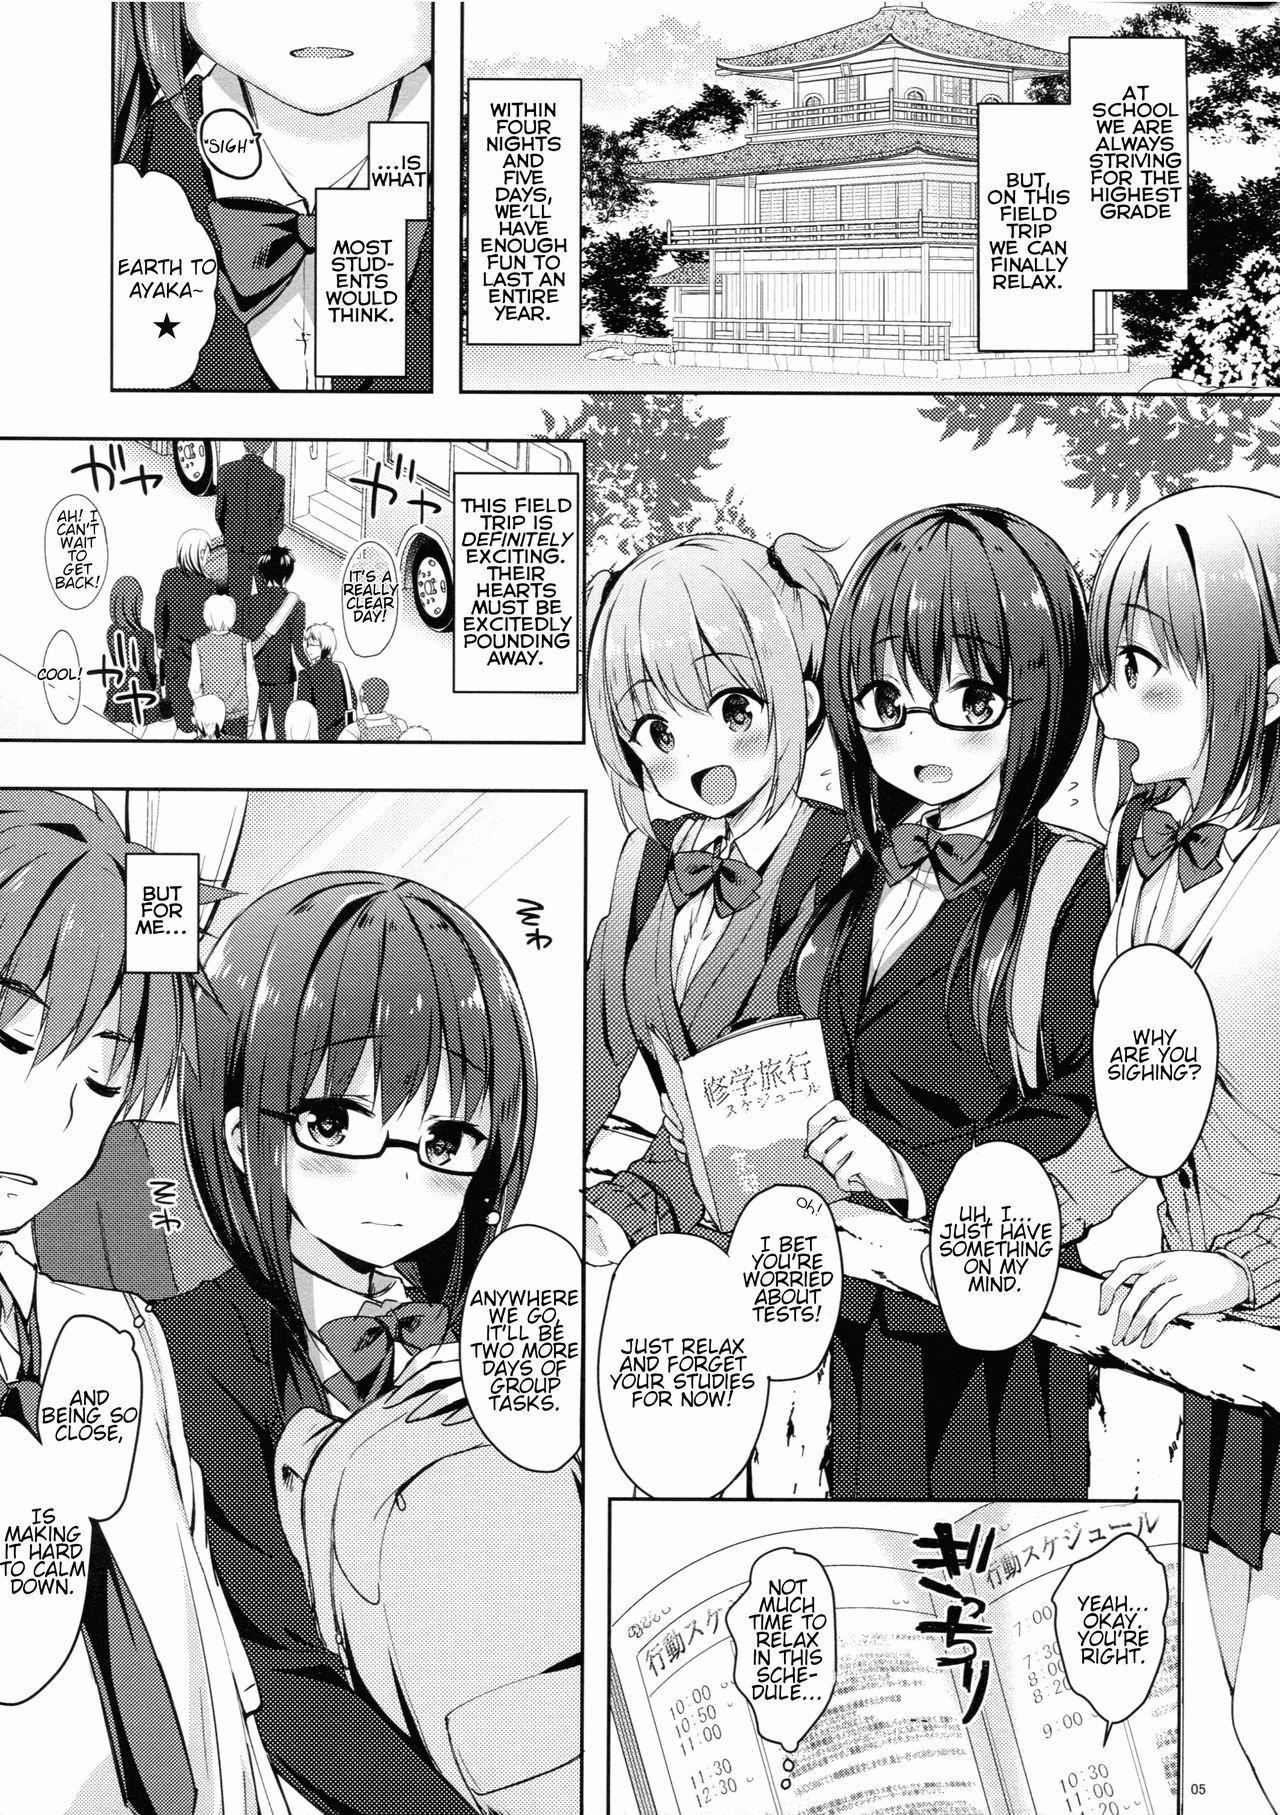 Yuutousei Ayaka no Uraomote Yarimakuri Shuugaku Ryokou Hen | The Two Sides of The Honors Student Ayaka - Endless Sex Field Trip Chapter 3